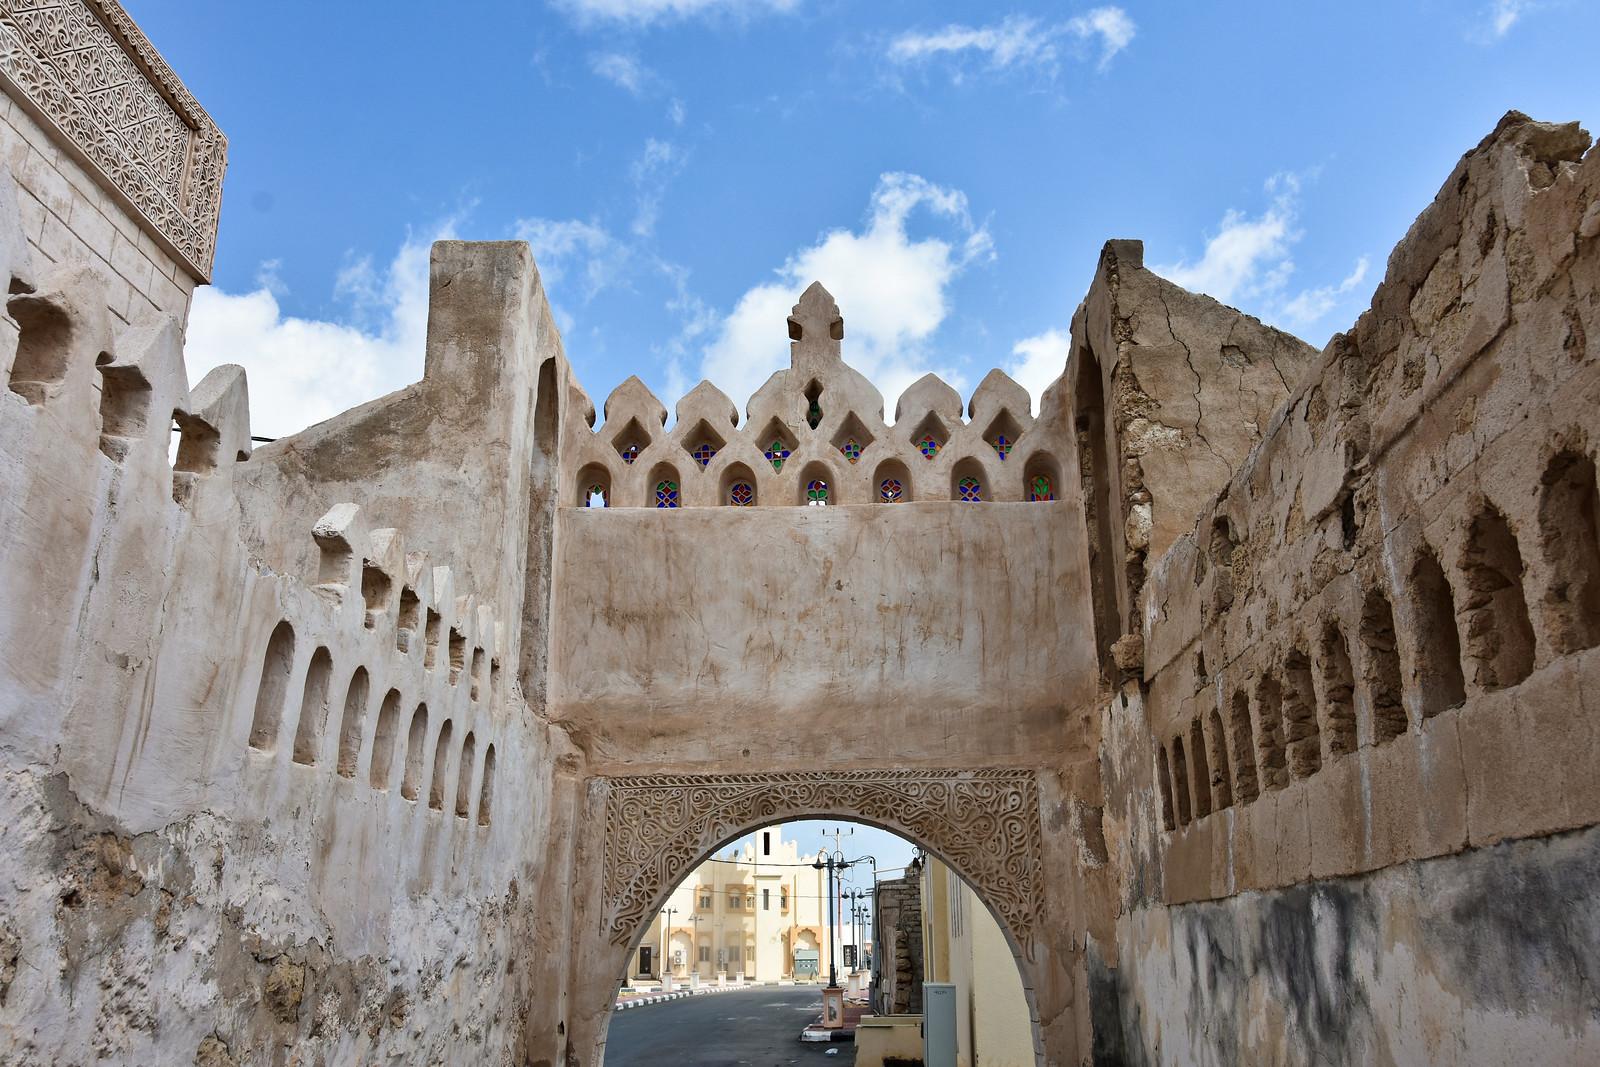 Detail of pearl merchant's house, early 20th century, Farasan Island, Jazan Region, Saudi Arabia  (2)